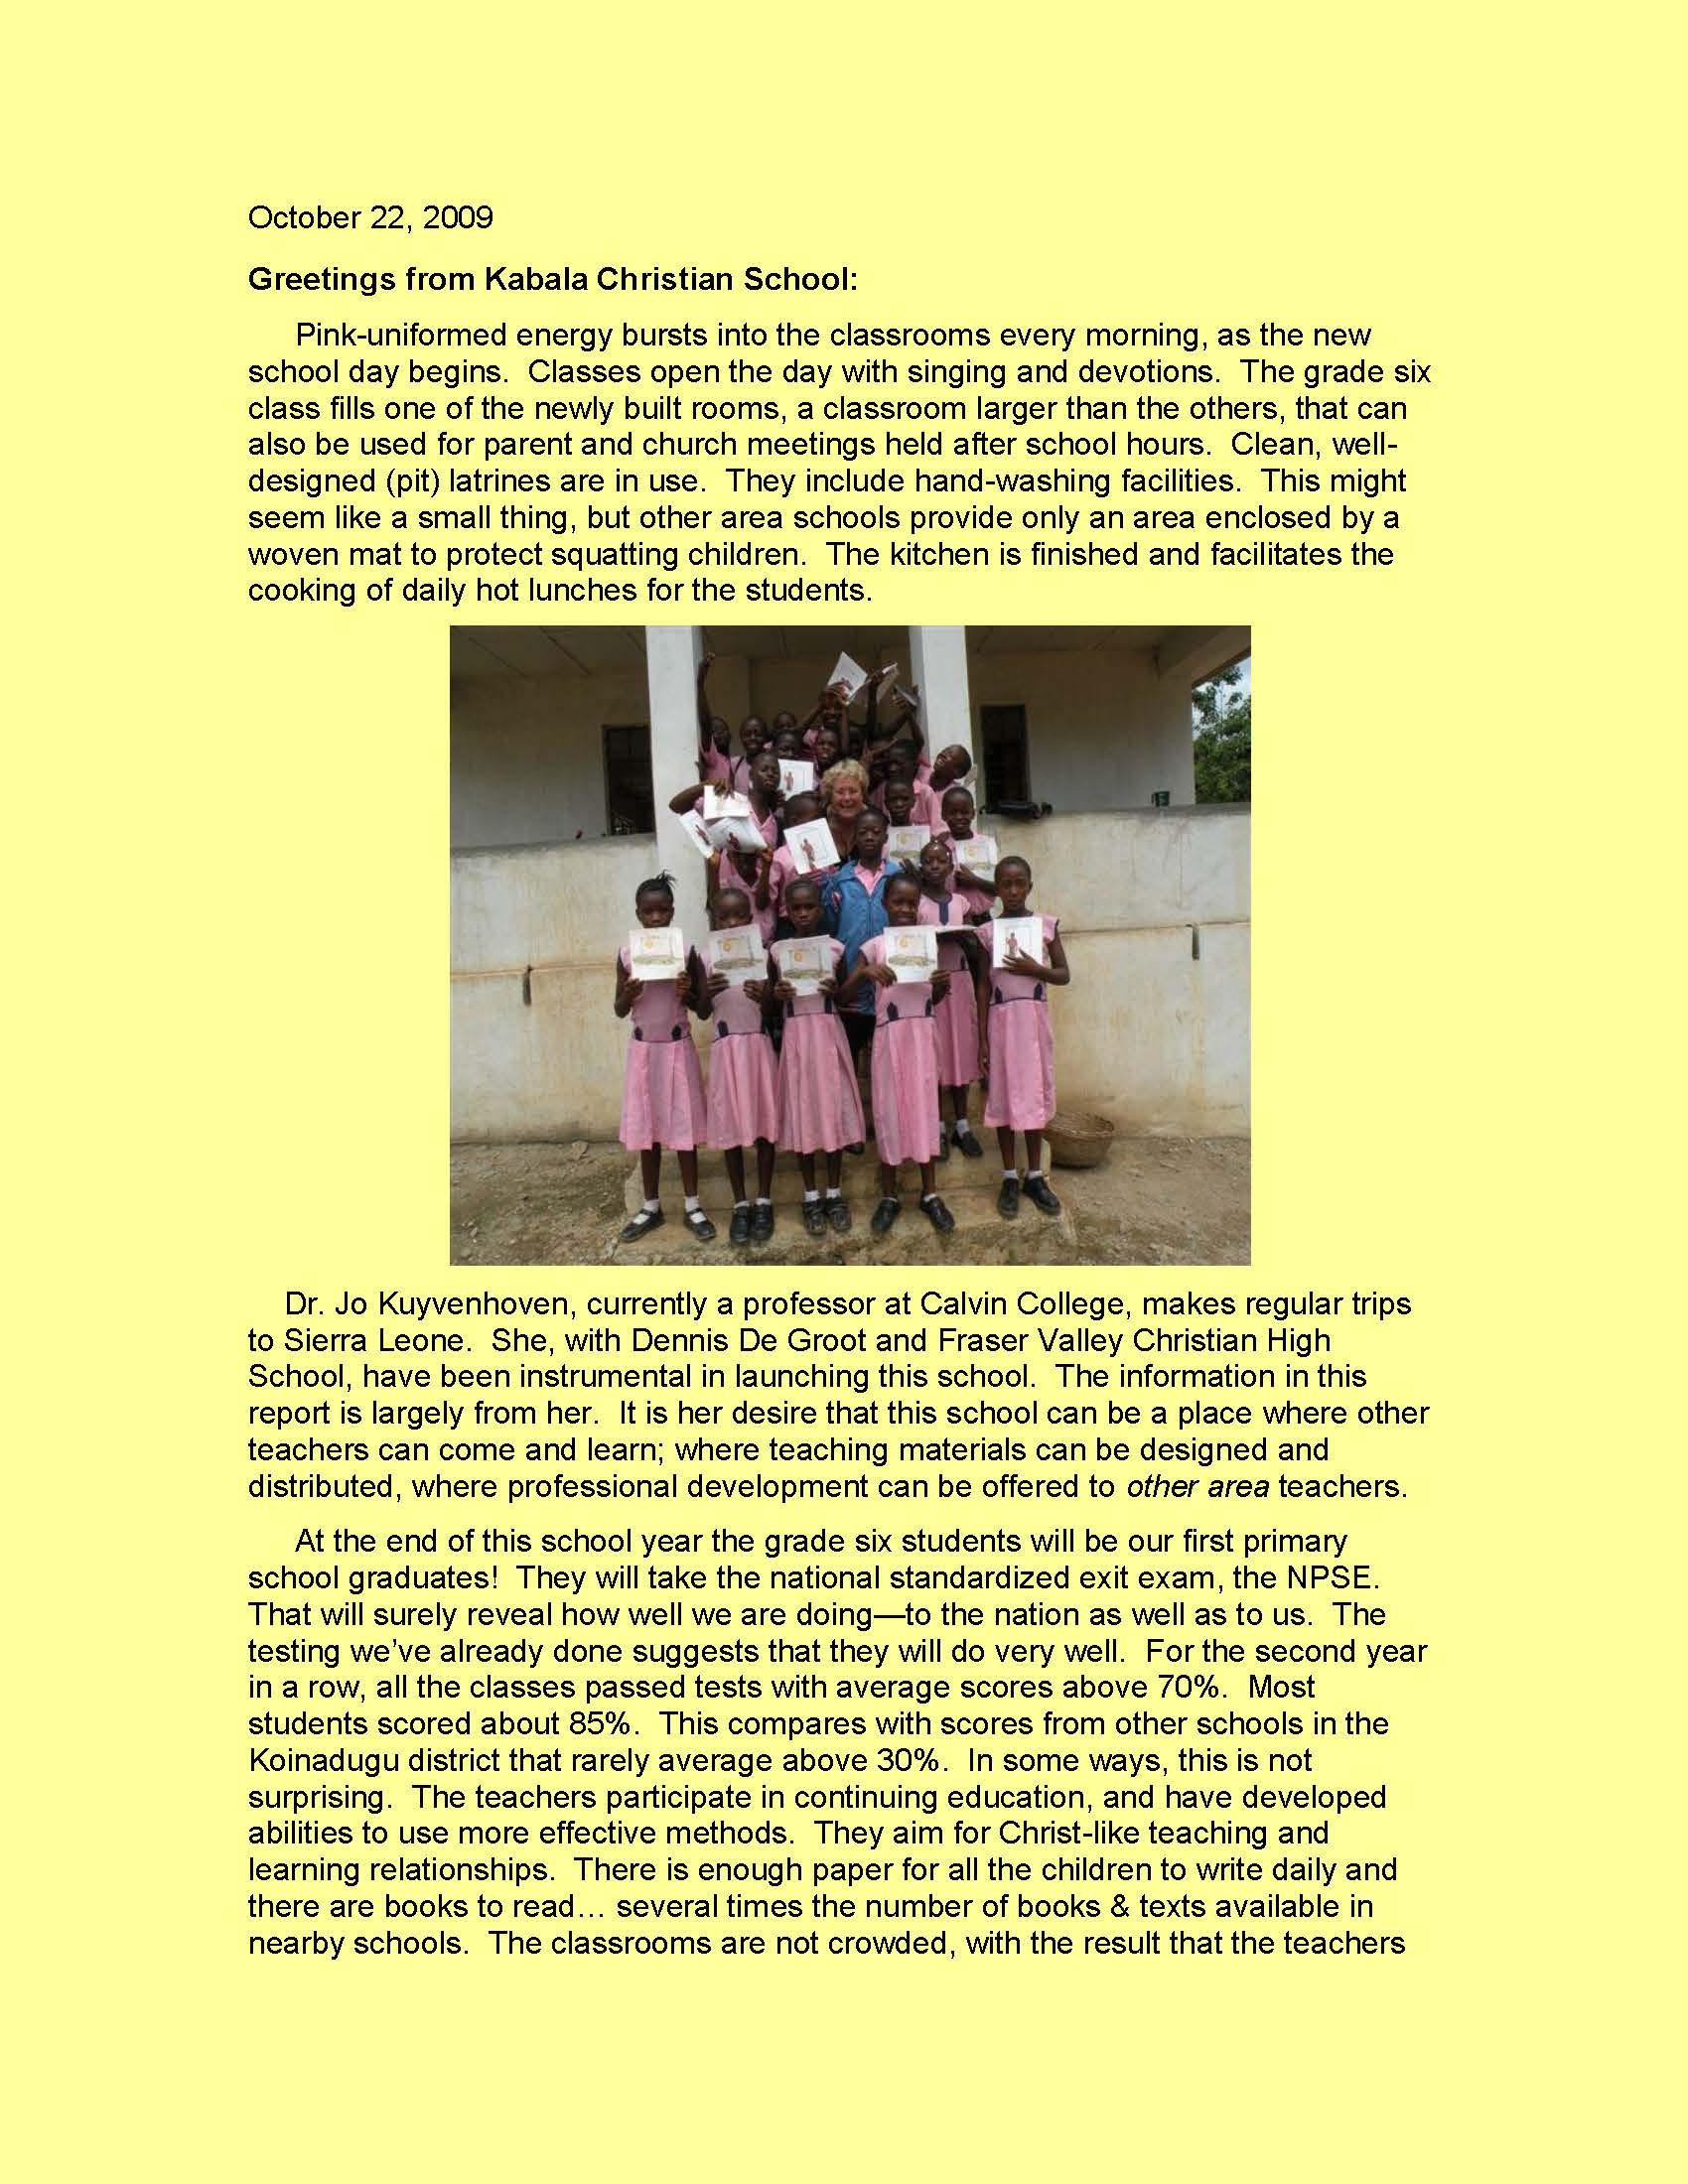 Kabala School Update  Oct  '09(3)_Page_1.jpg